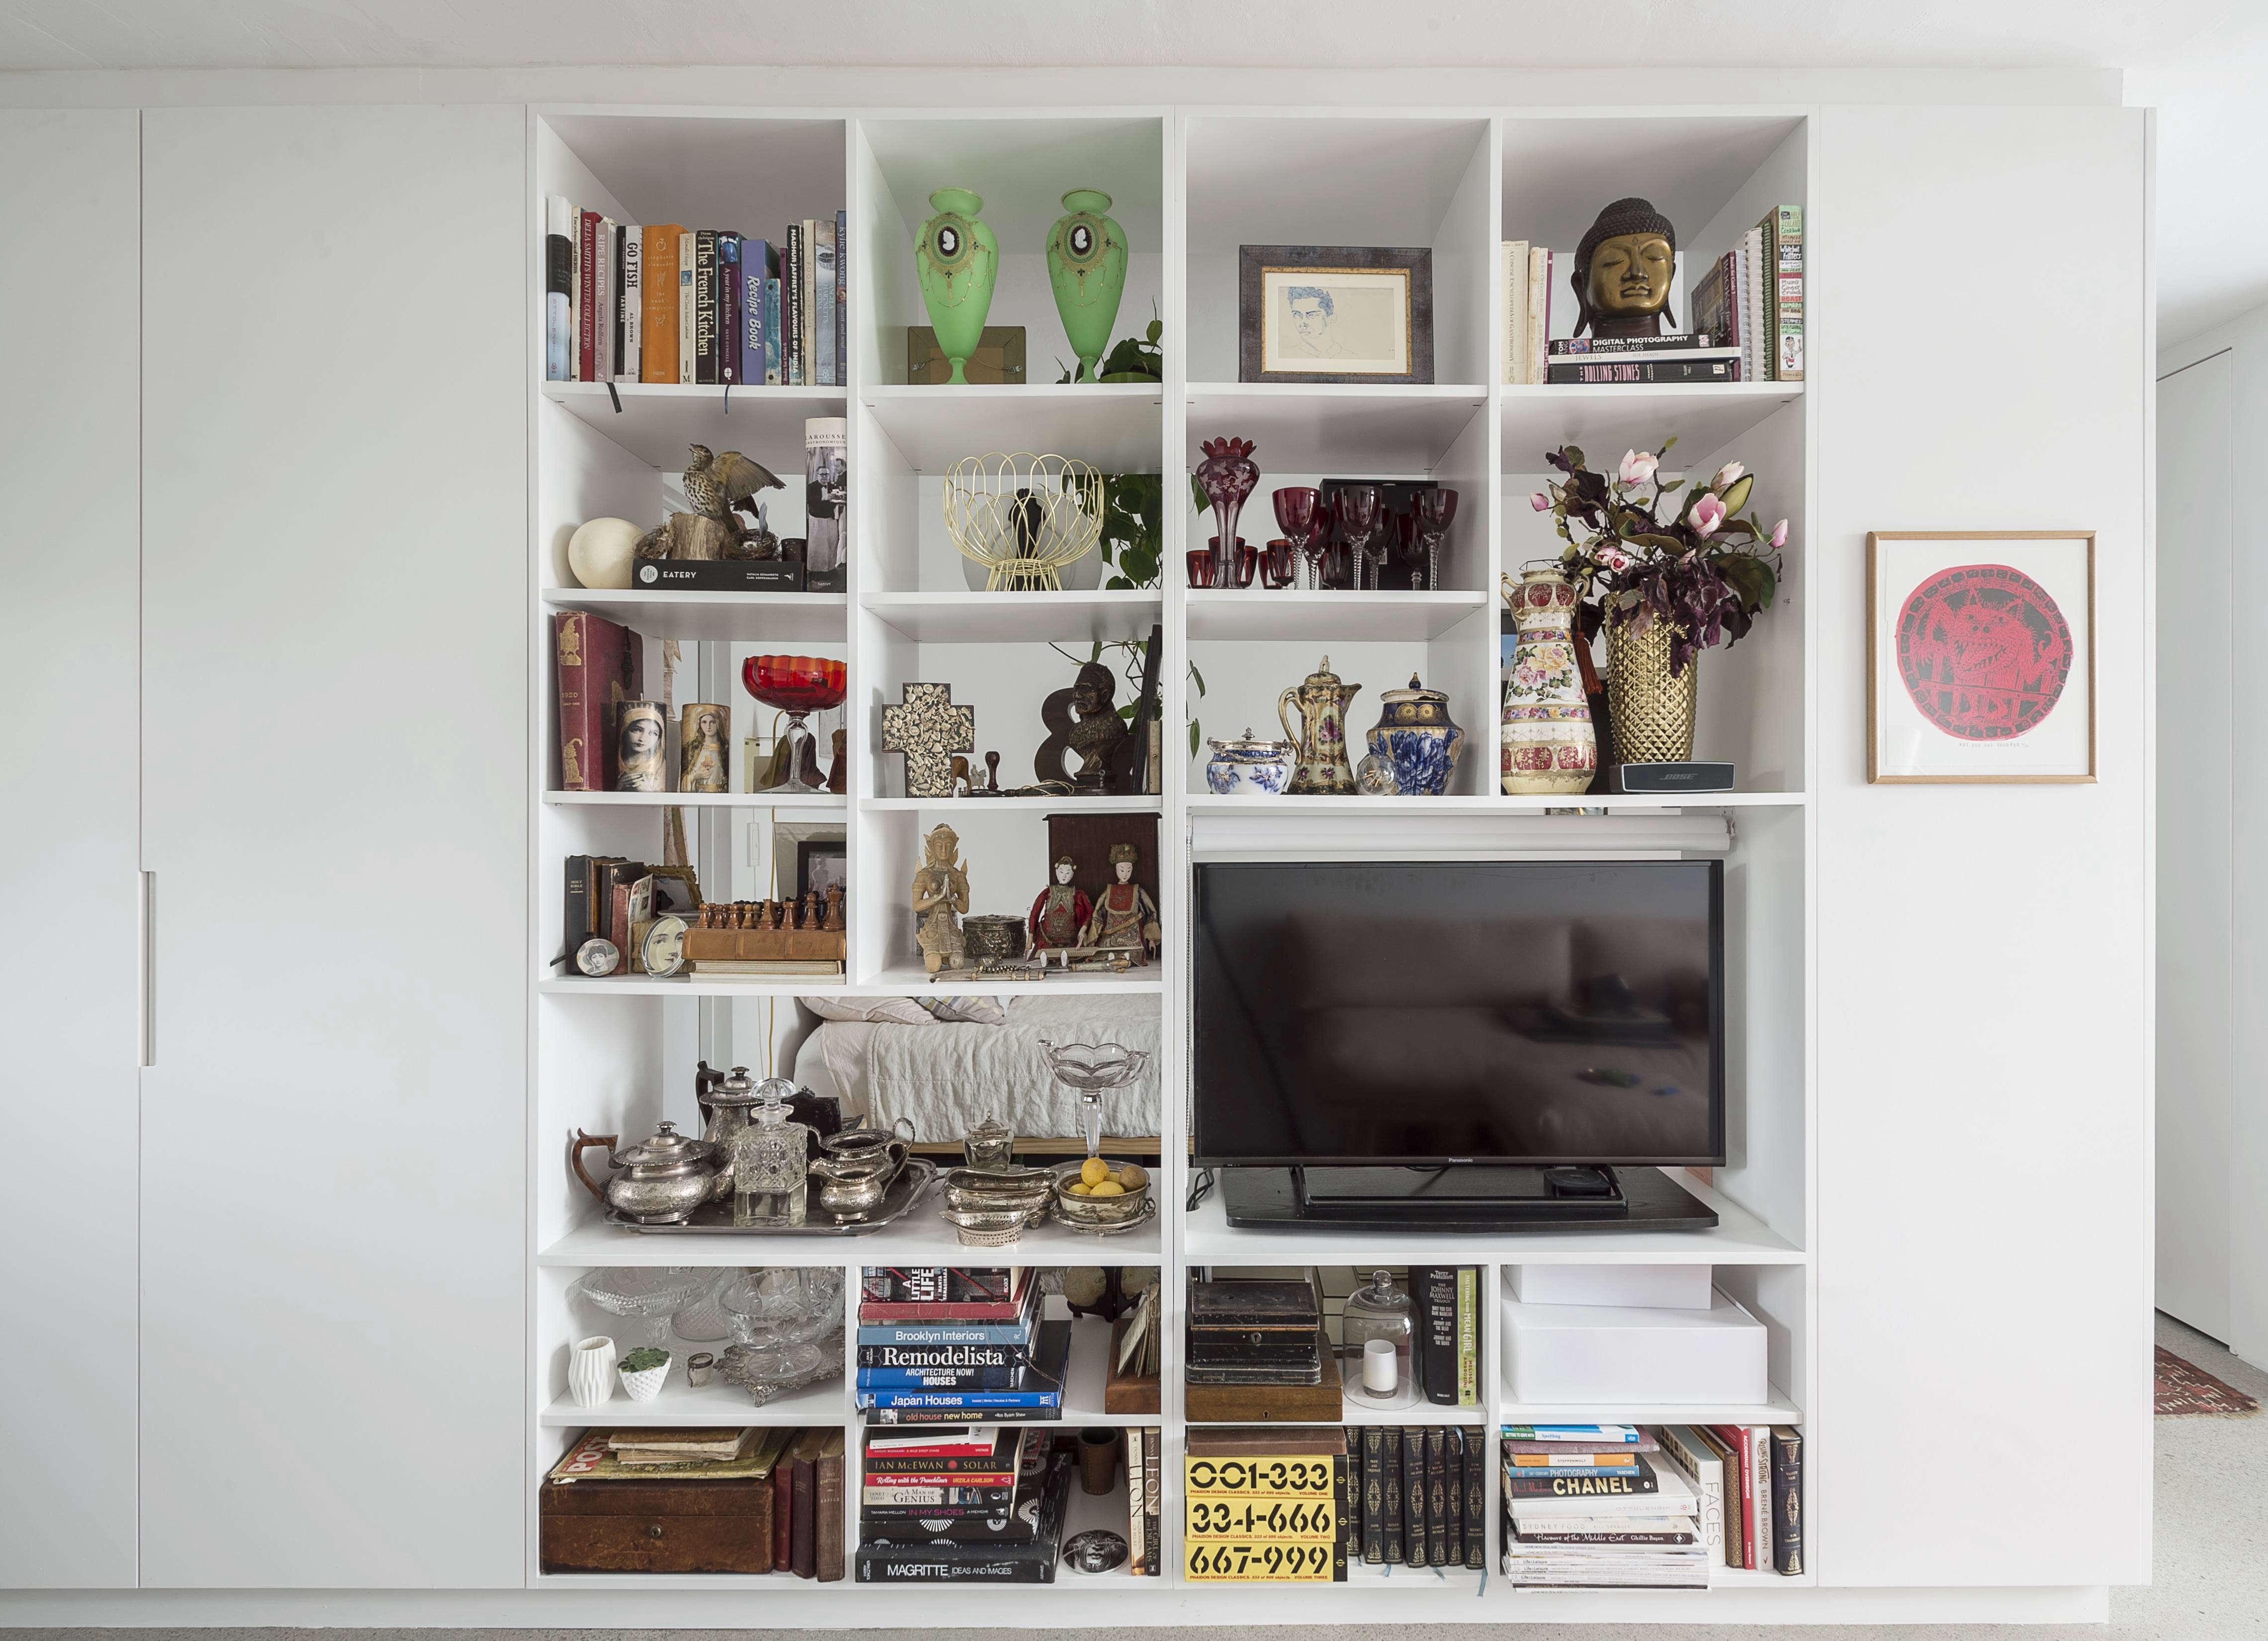 Karin Montgomery Spath New Zealand Studio Kitchen Open Shelves Divider, Photo by Matthew Williams